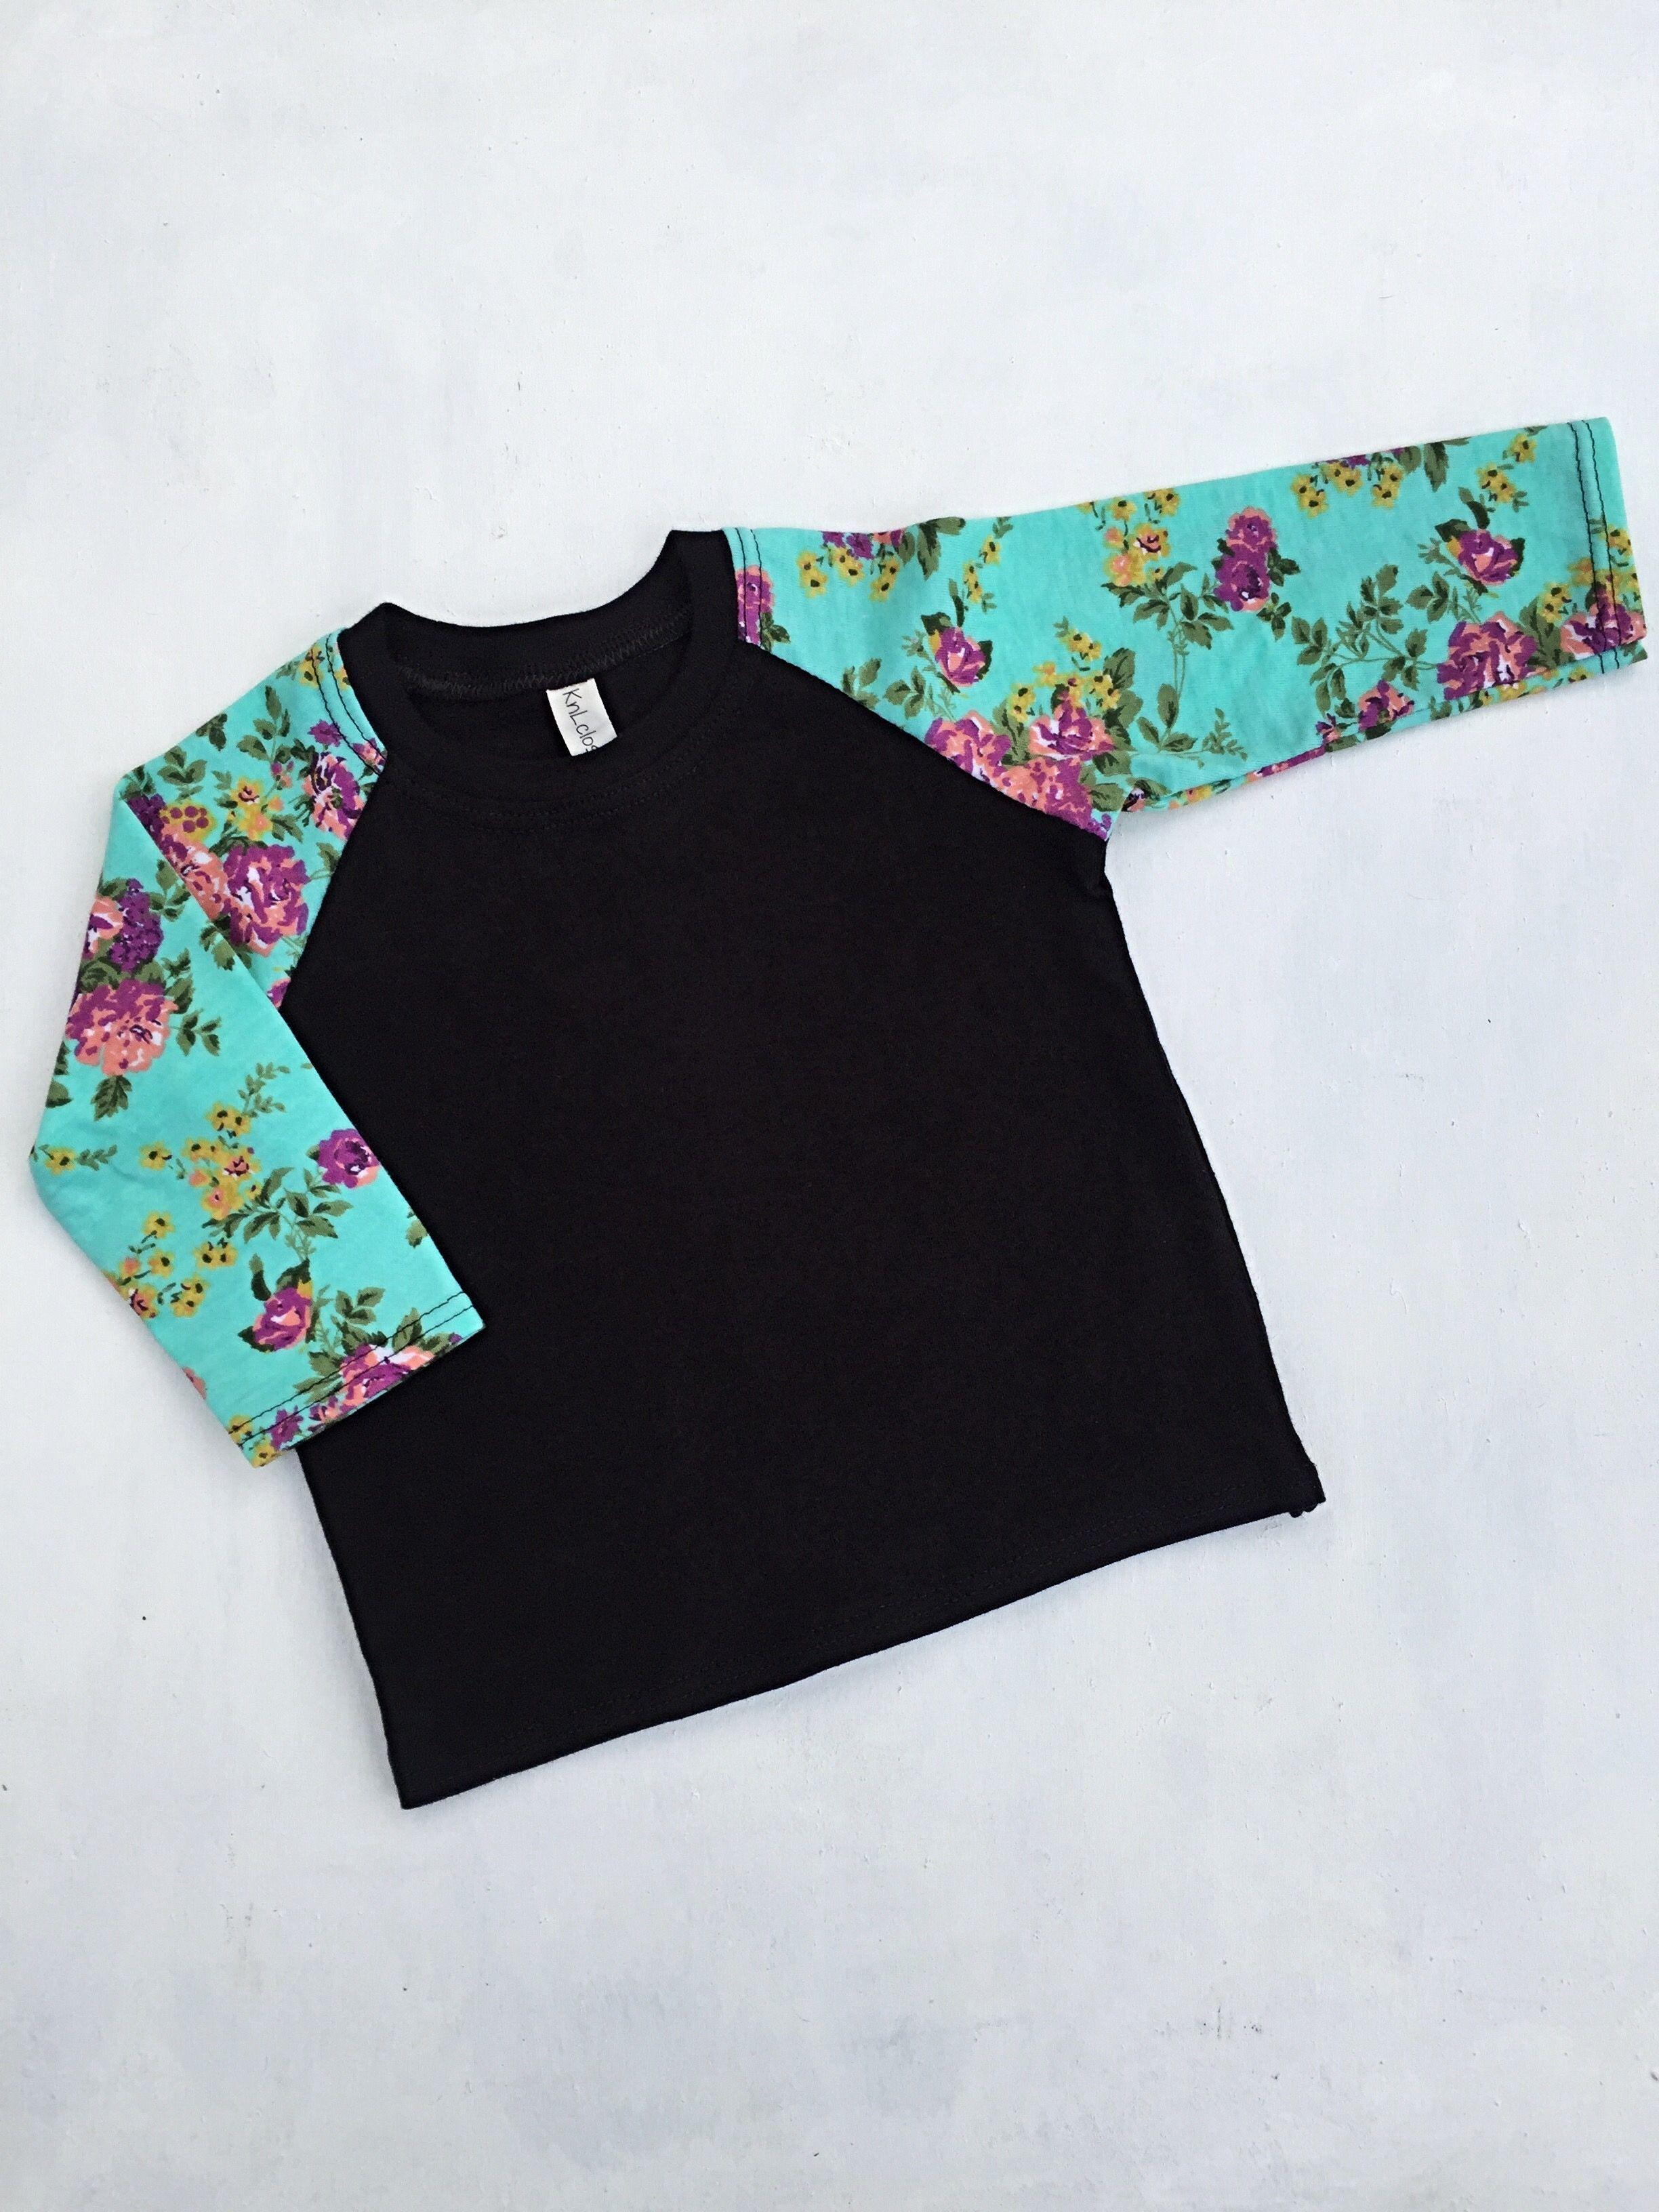 Floral raglan shirt baby raglan baby clothes floral baby shirt